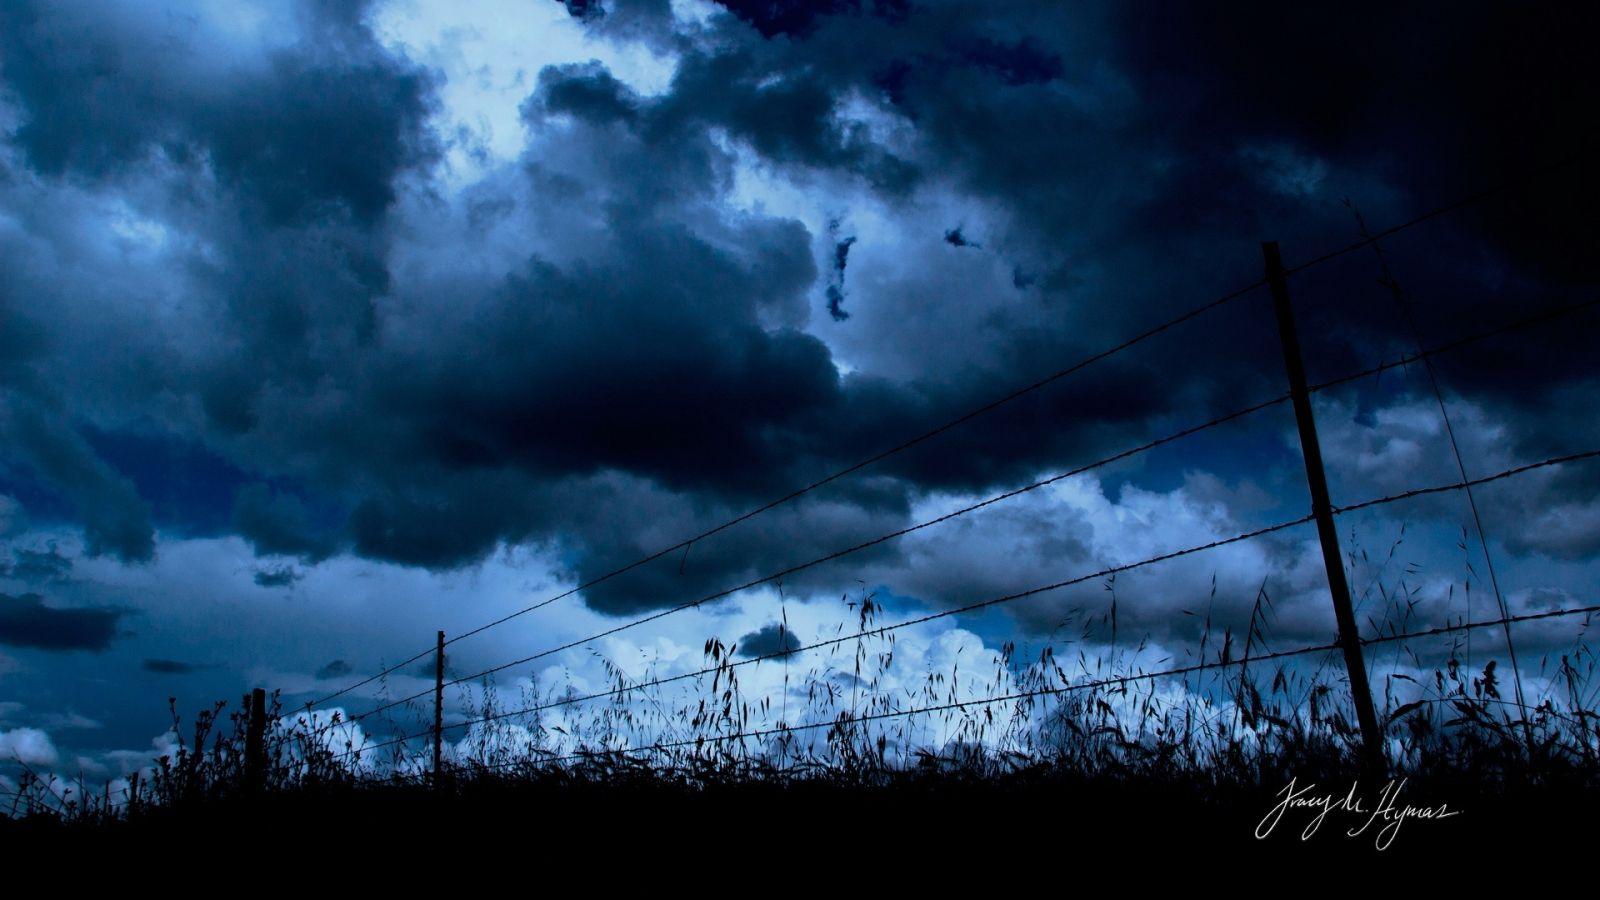 dark sky wallpaper dark sky hd wallpaper dark sky image night dark